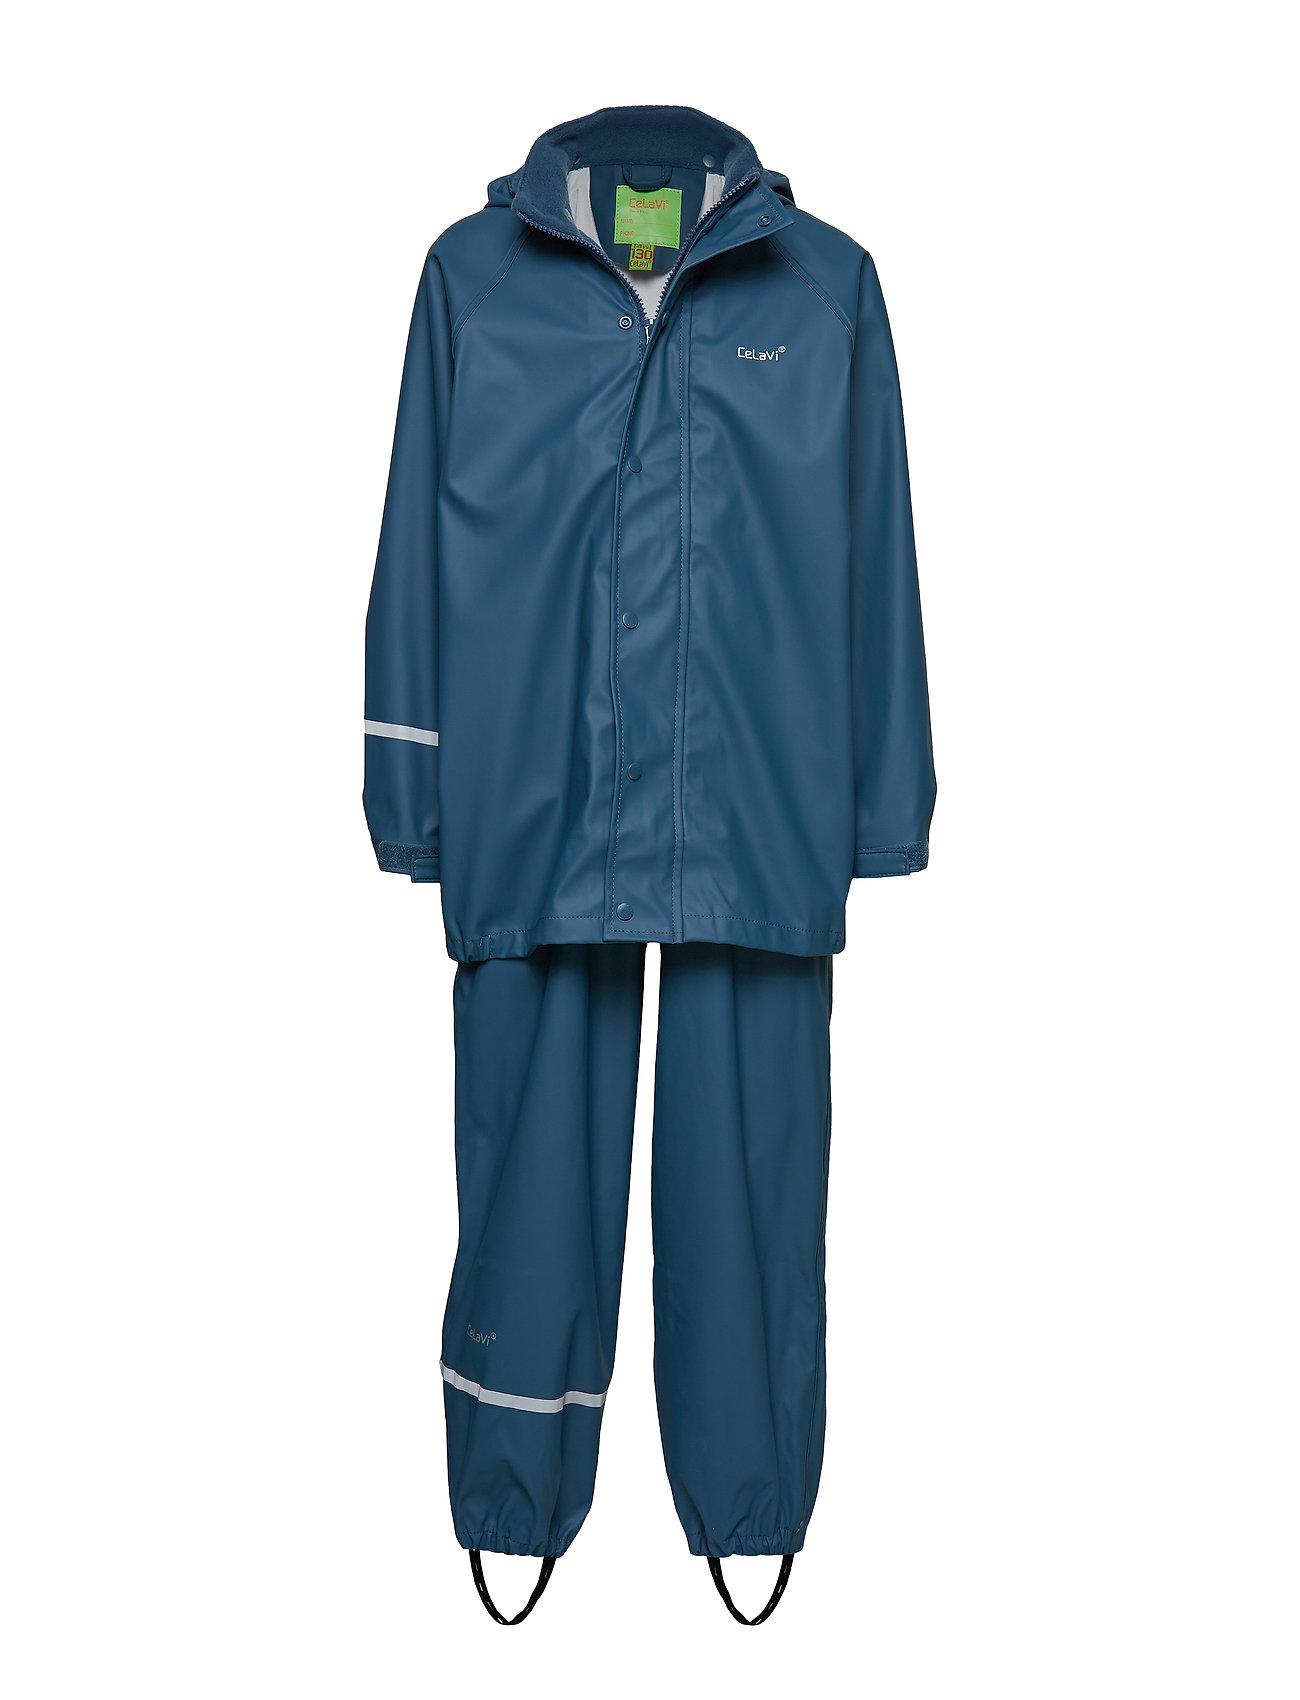 Image of Basci Rainwear Set, Solid Regntøj Blå CeLaVi (2382516993)